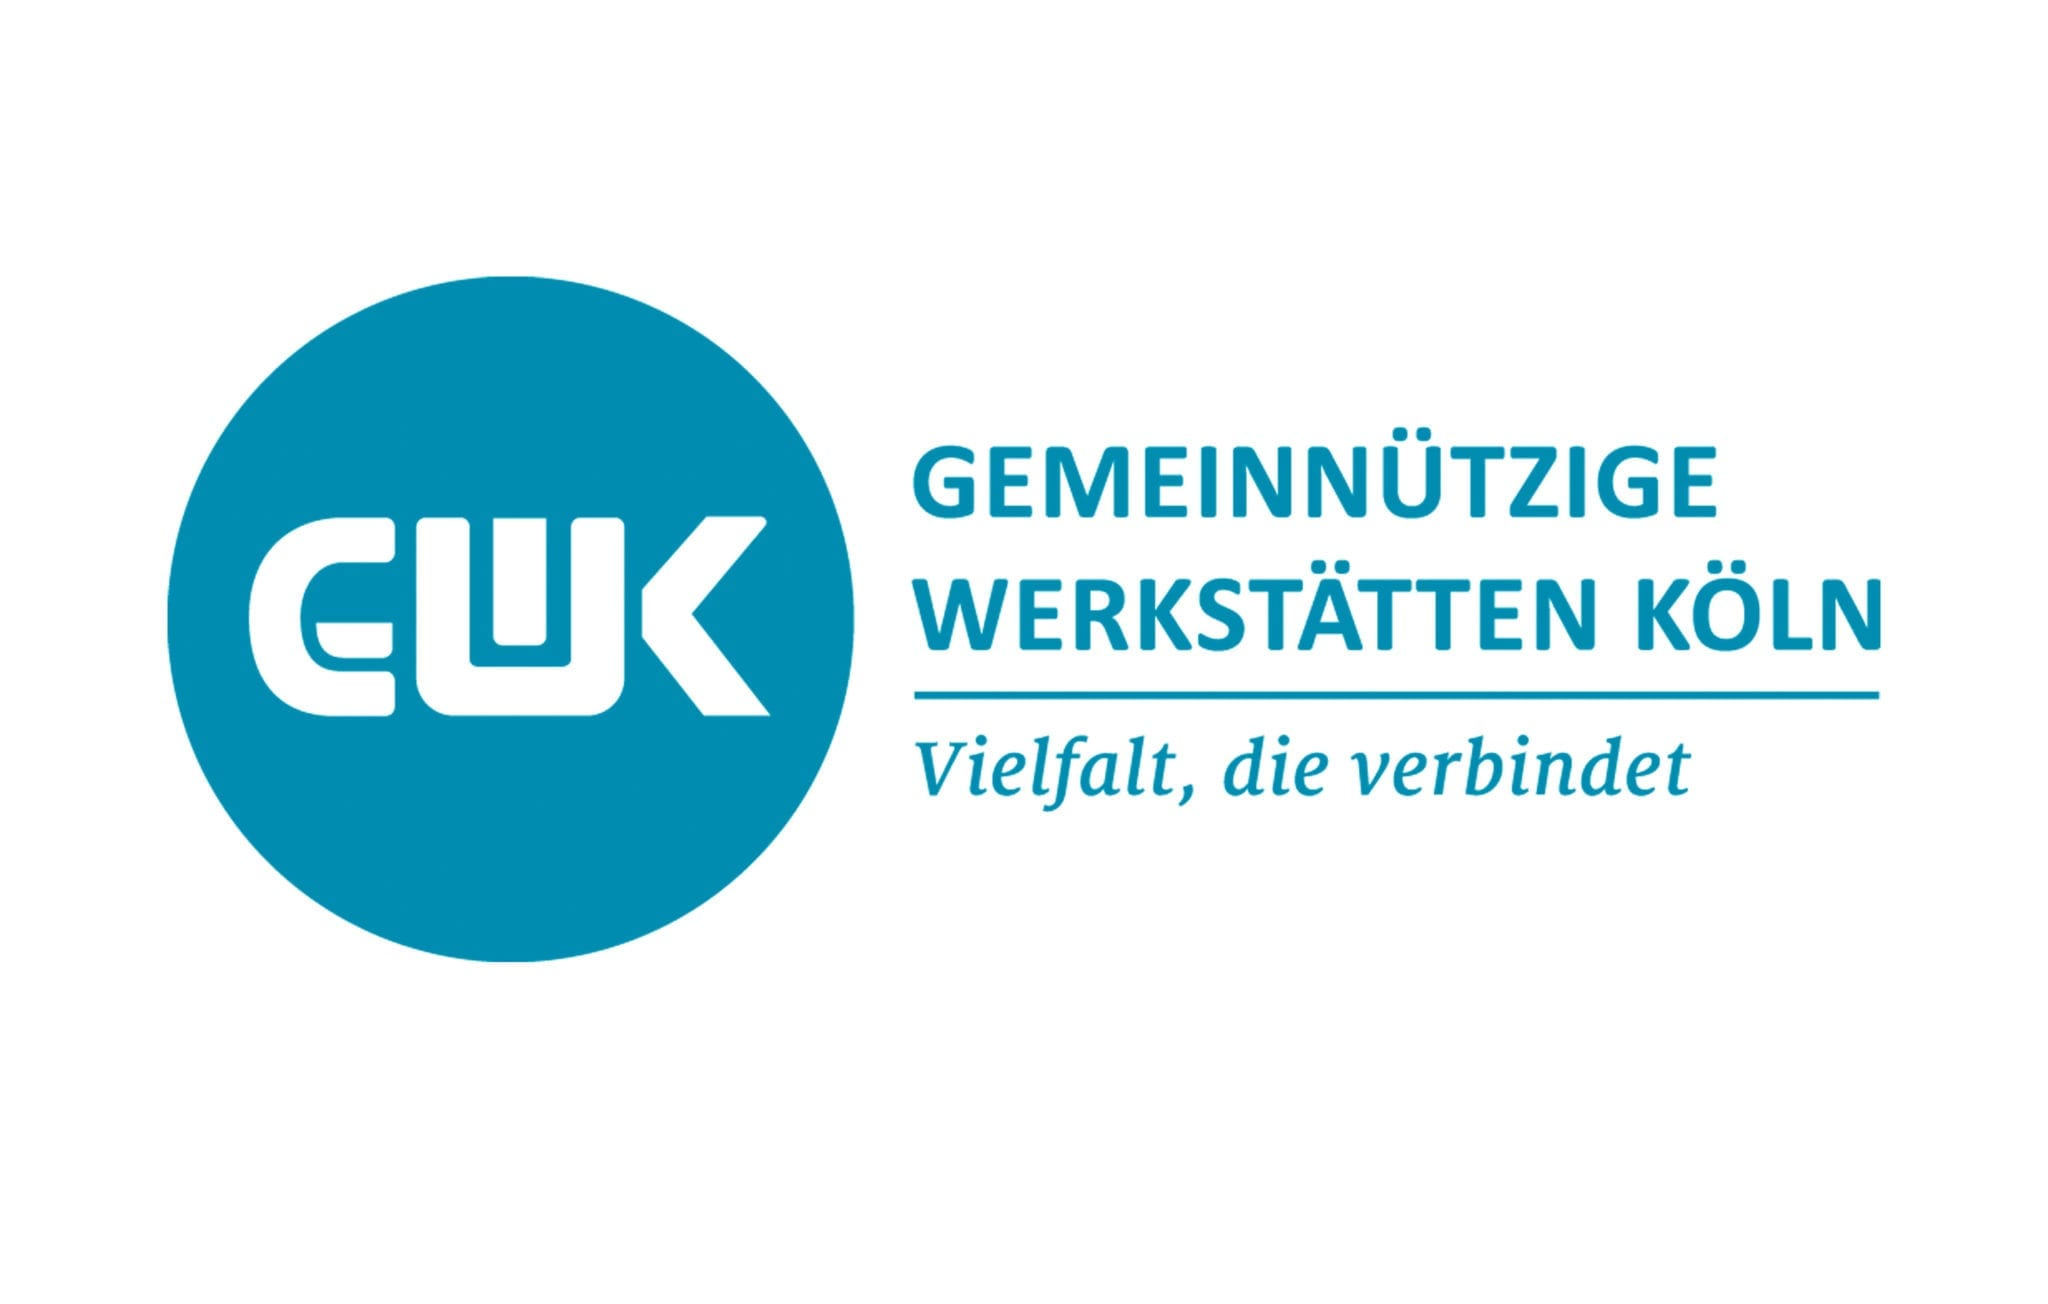 Logo der Gemeinnützigen Werkstätten Köln